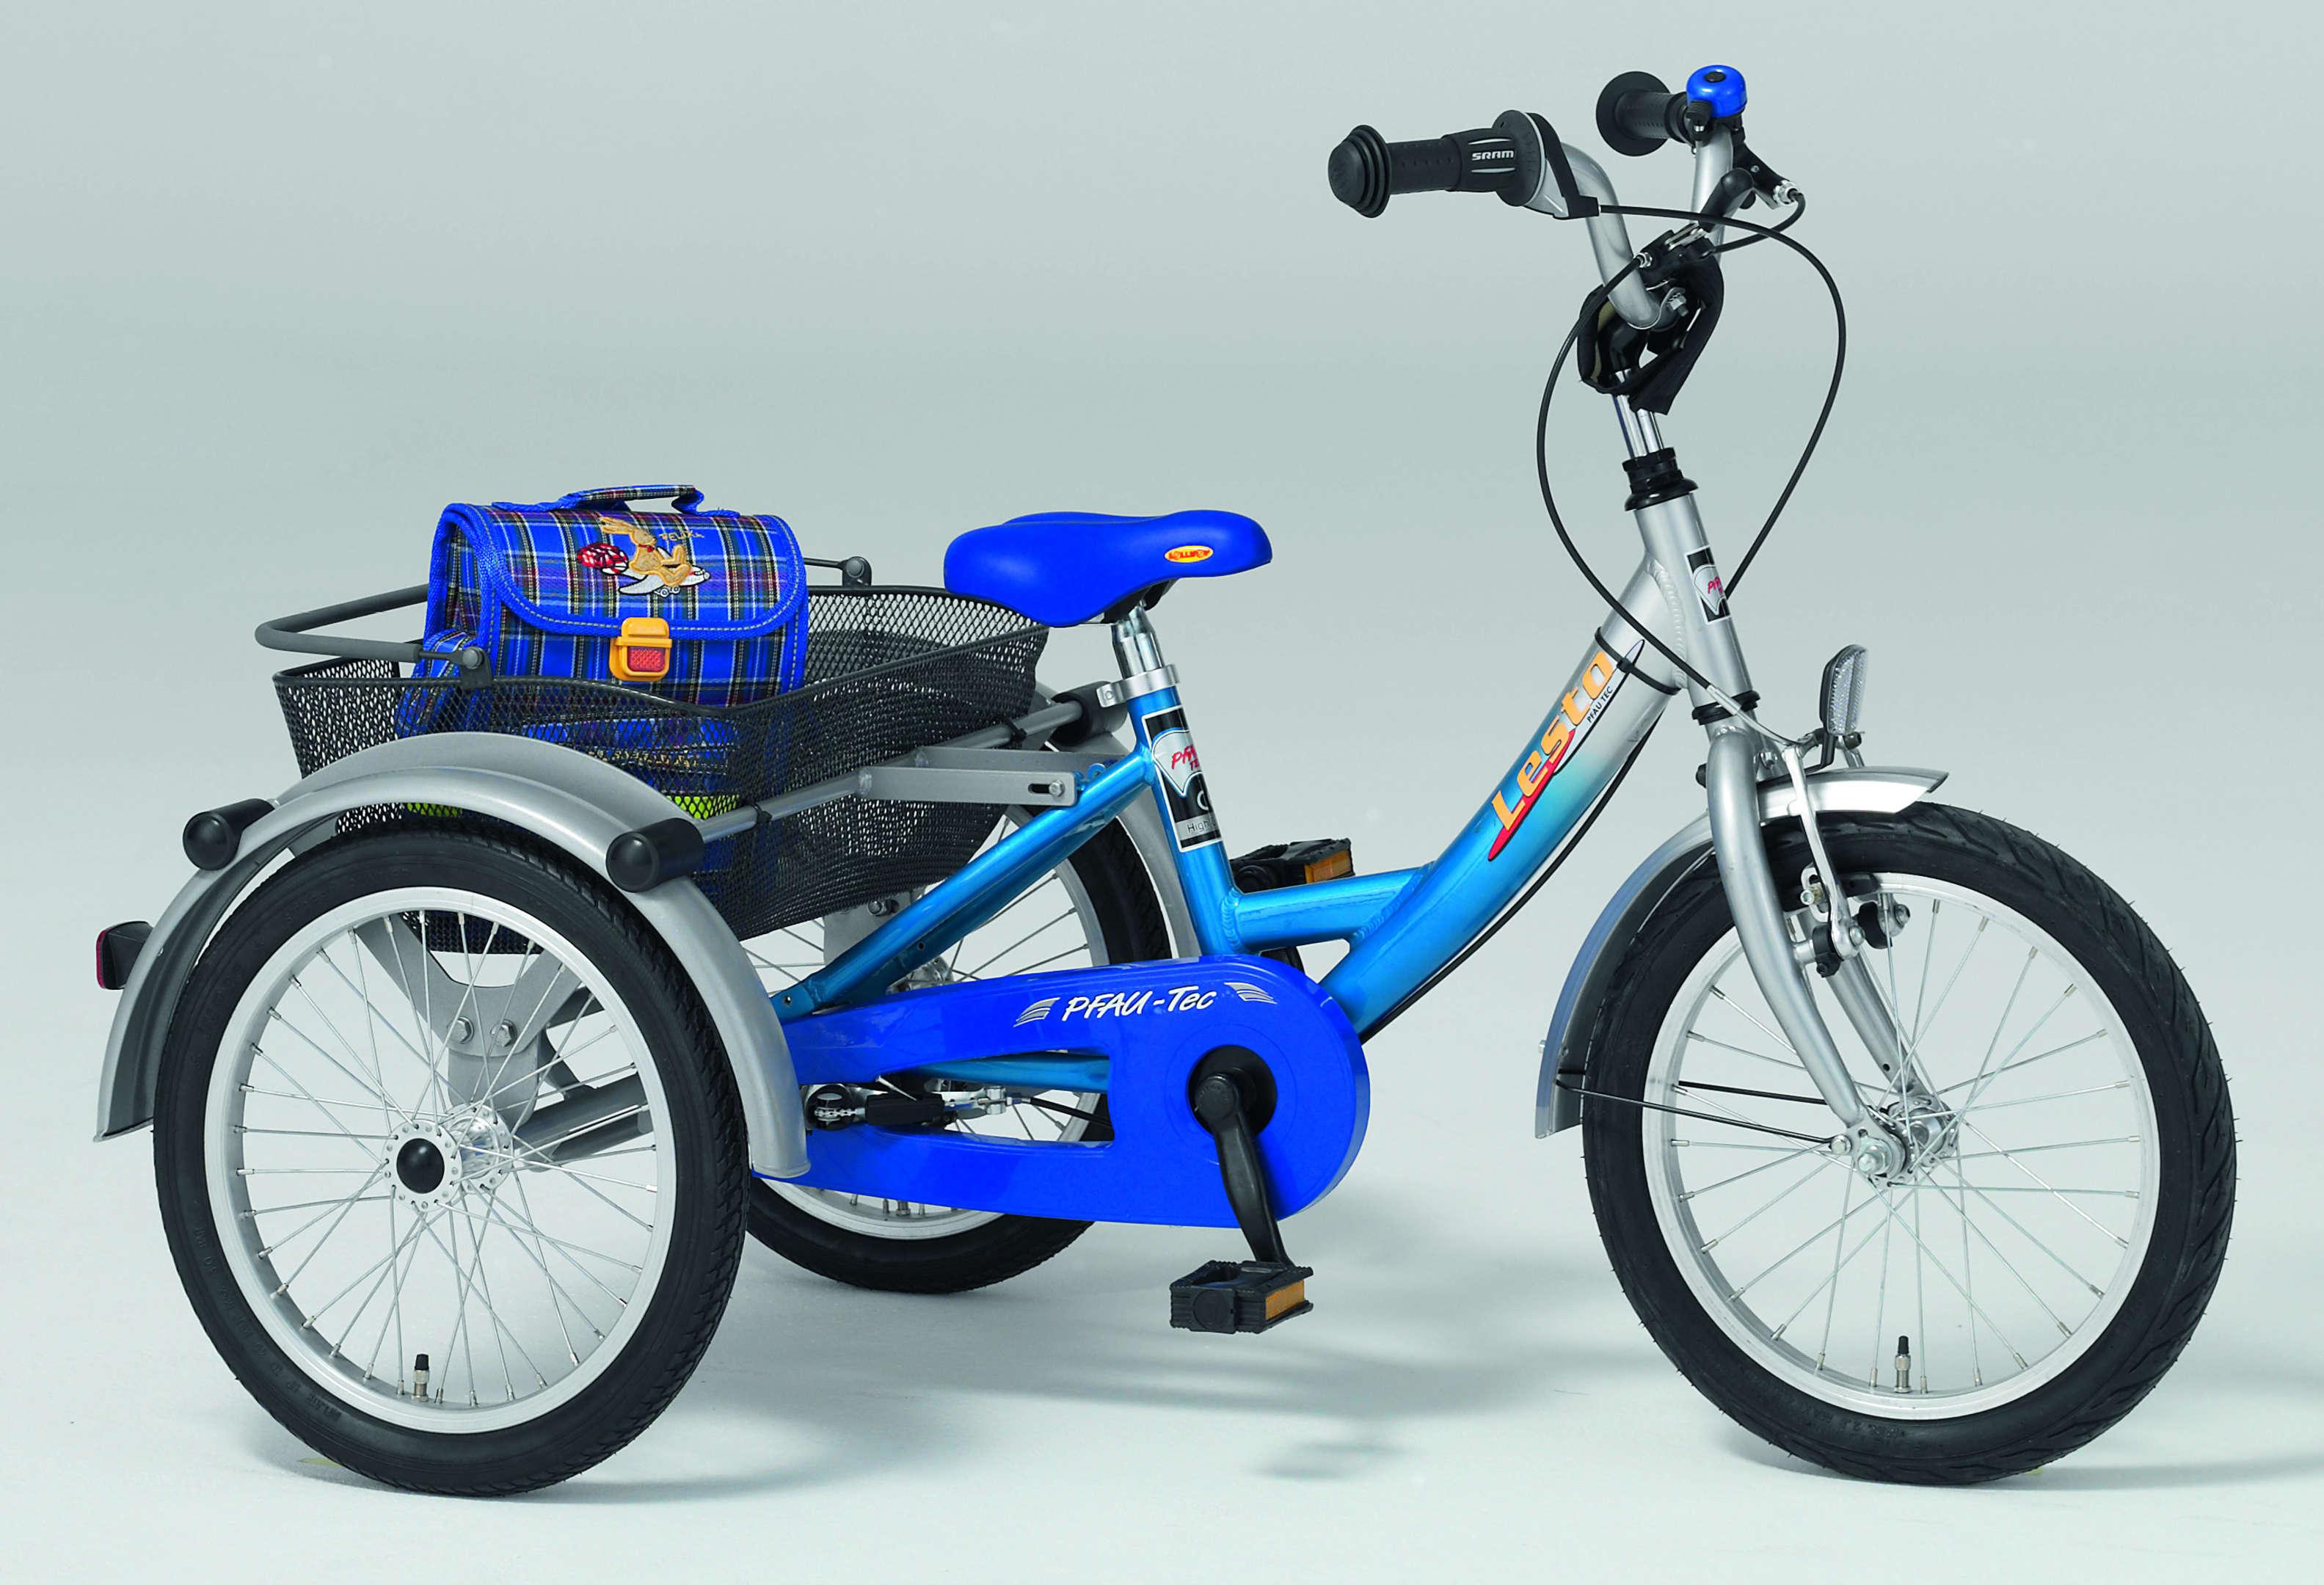 pfau tec dreirad lesto 16 eurorad bikeleasingeurorad bikeleasing. Black Bedroom Furniture Sets. Home Design Ideas